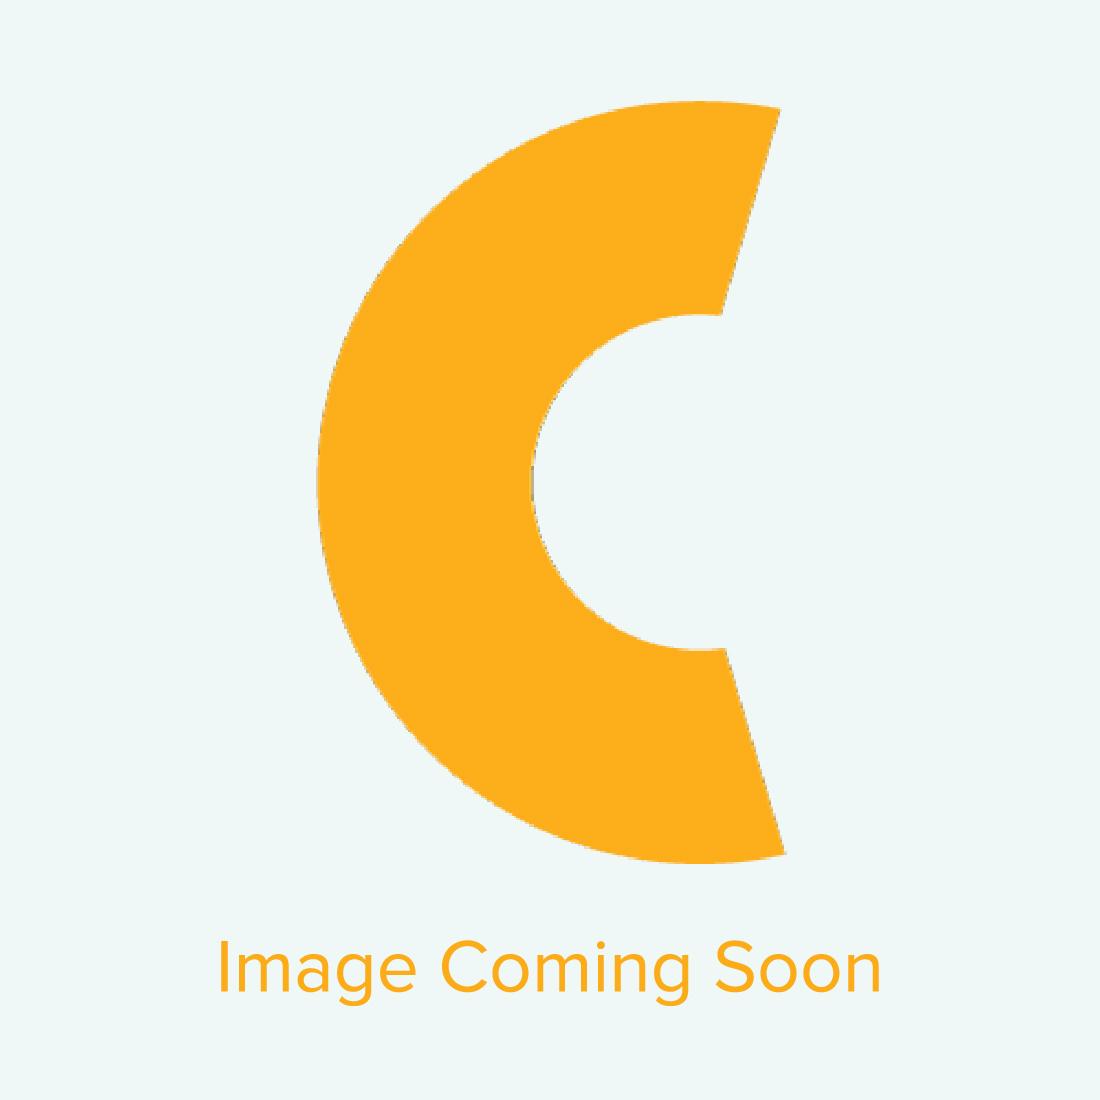 Epson Stylus 1430 - Sublijet IQ Quick Connect Kit (no ink)